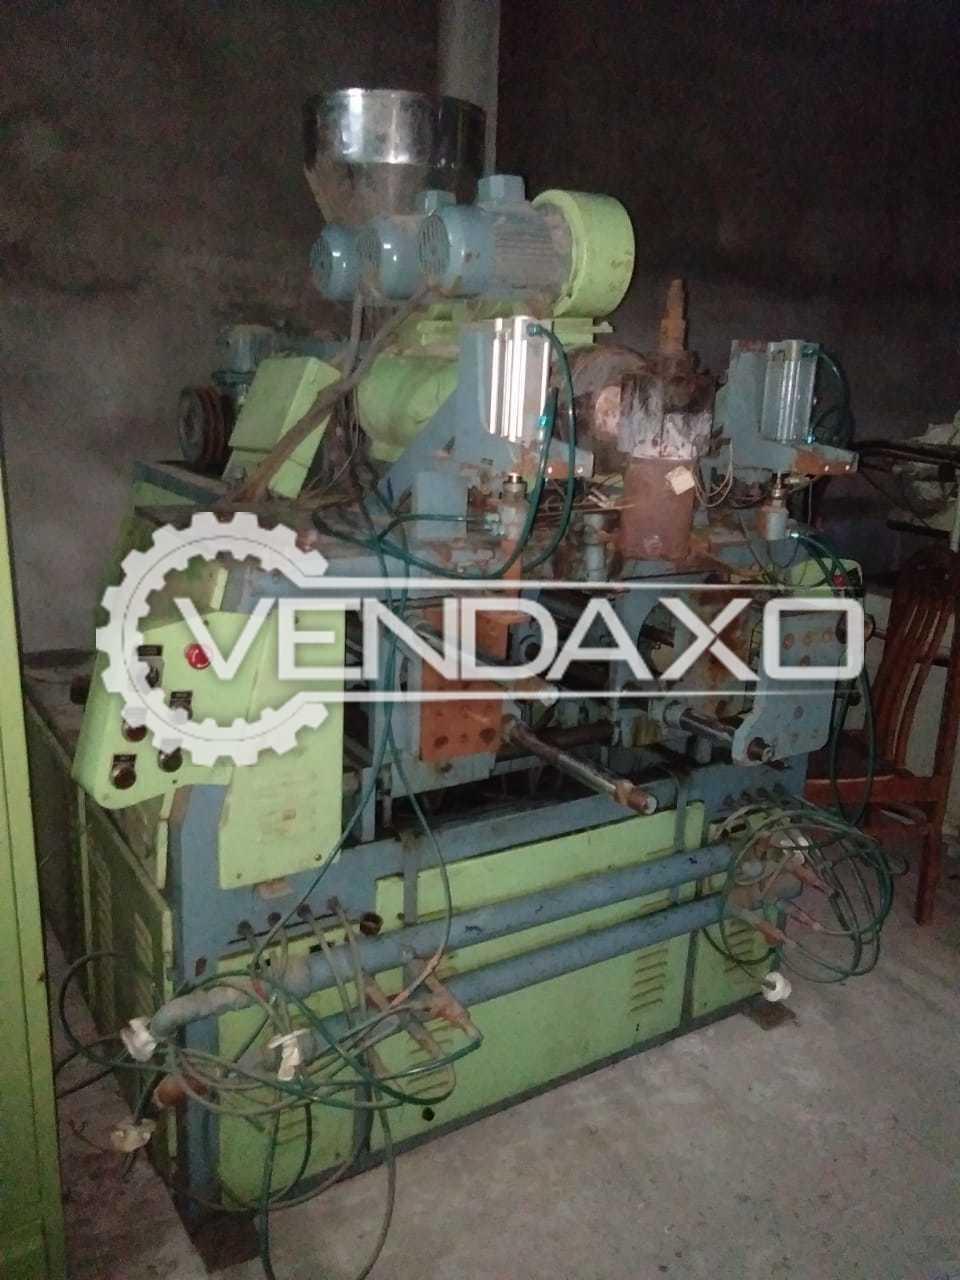 CMP Extrusion Blow Moulding Machine - 1/2 Liter, 2004 Model